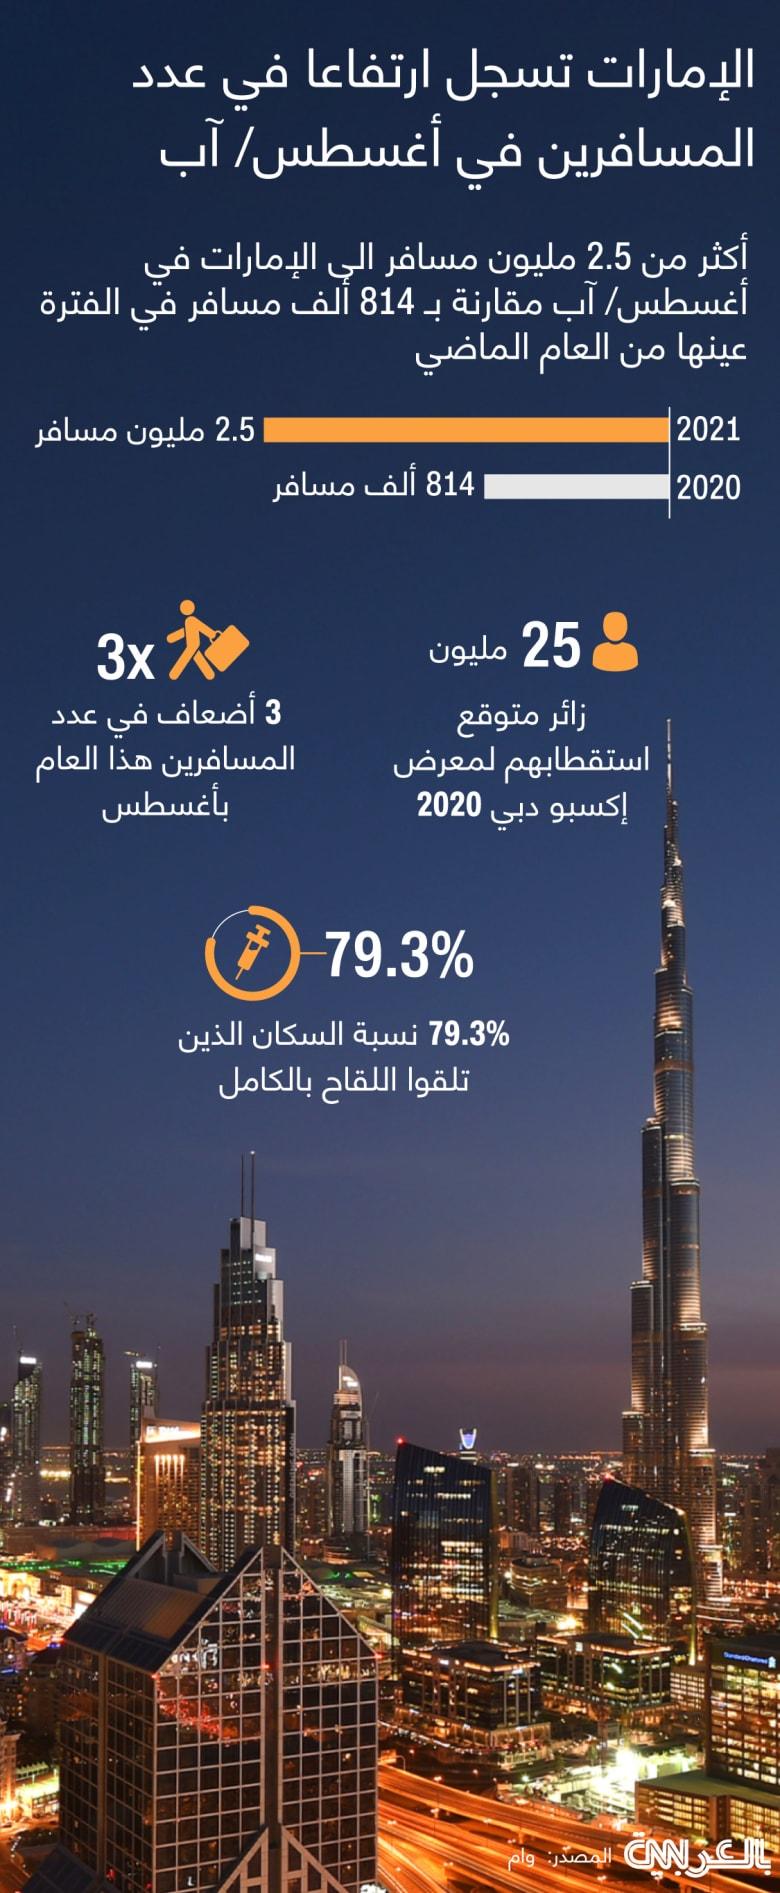 UAE-travel-rises-expo-AUG-2021